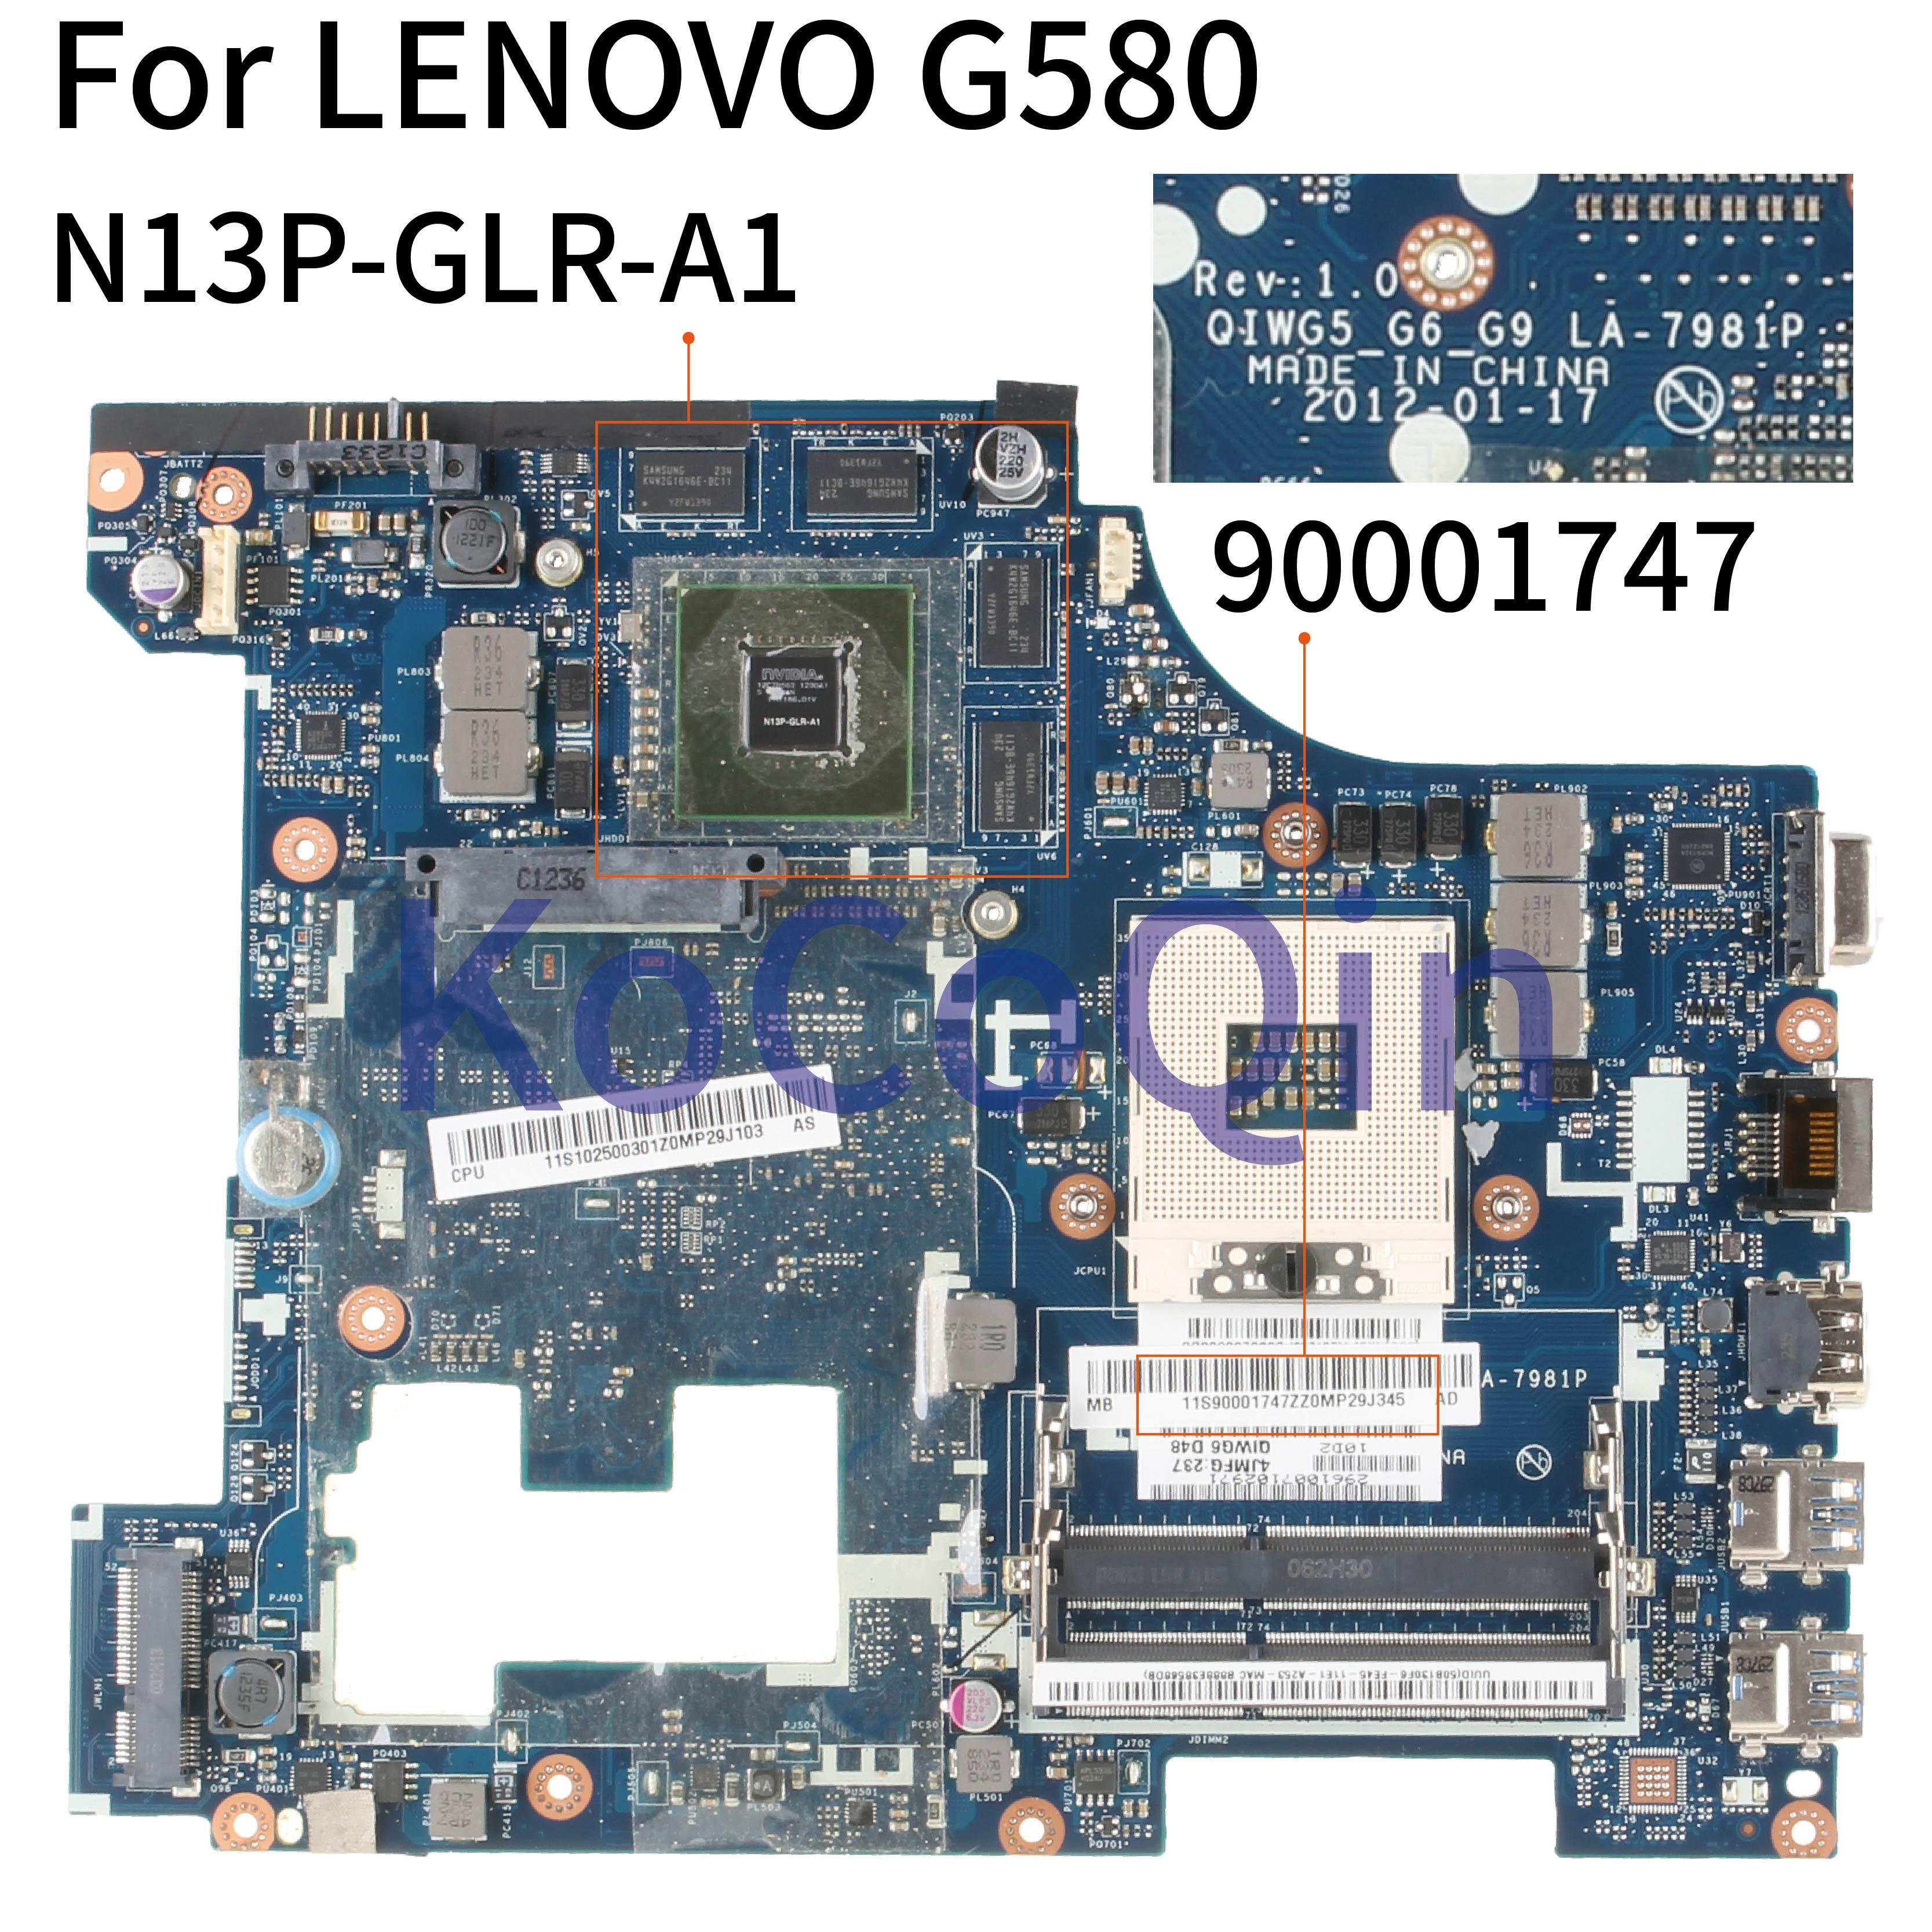 KoCoQin Laptop Motherboard For LENOVO G580 GT635M HM76 15' Inch Mainboard QIWG5 G6 G9 LA-7981P 90001747 SLJ8E N13P-GLR-A1